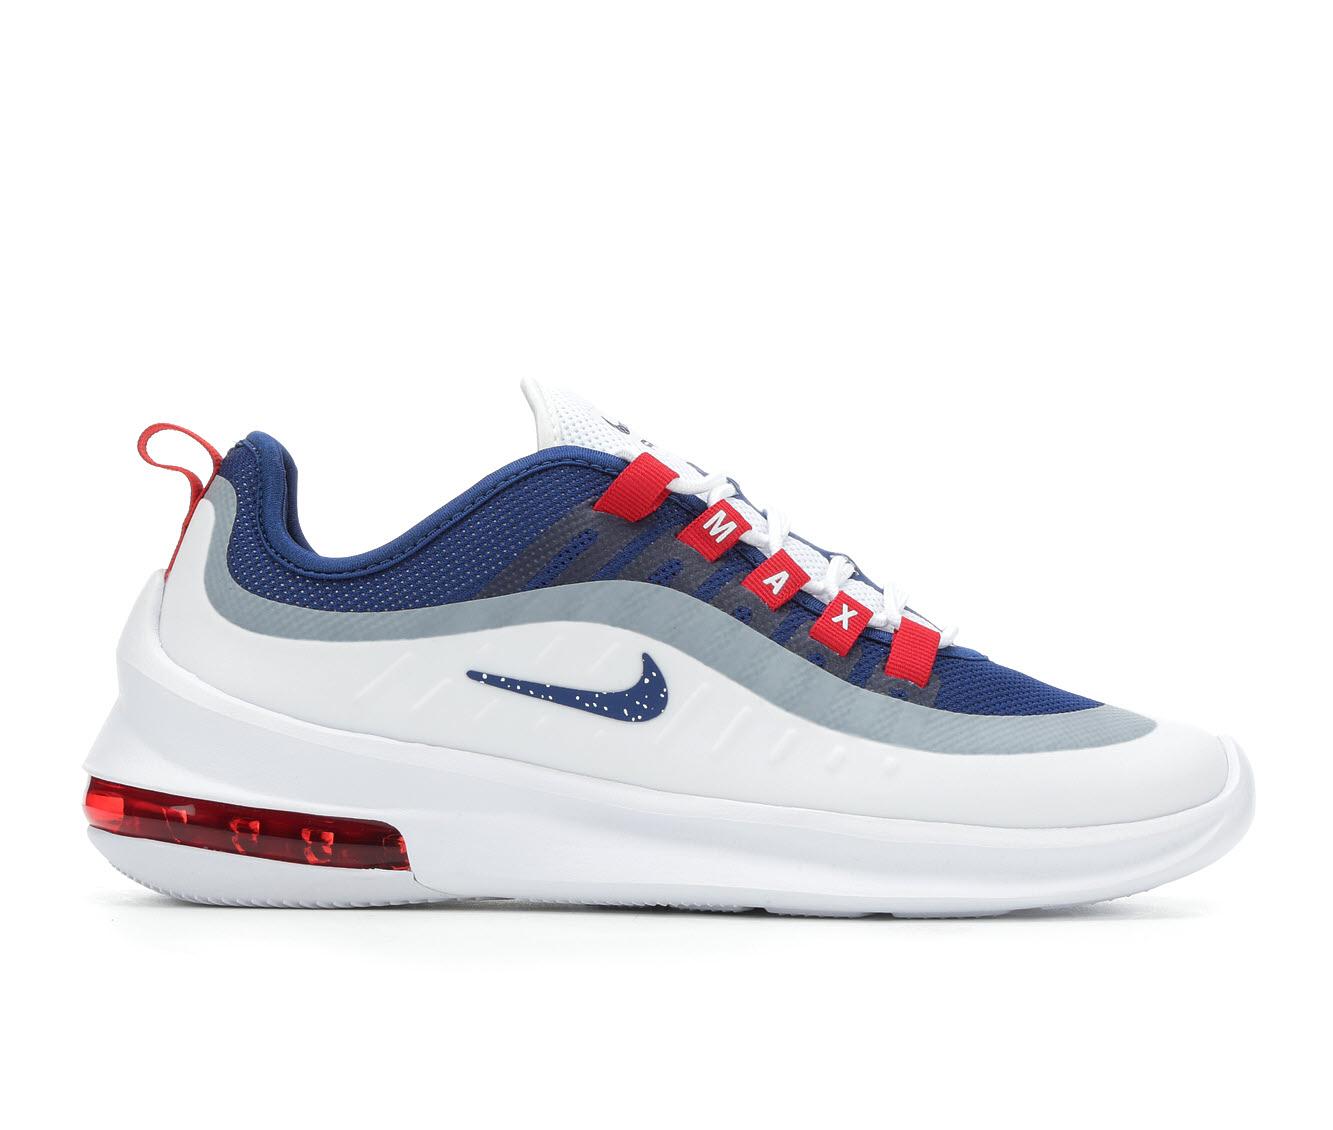 Nike Air Max Axis Men's Athletic Shoe